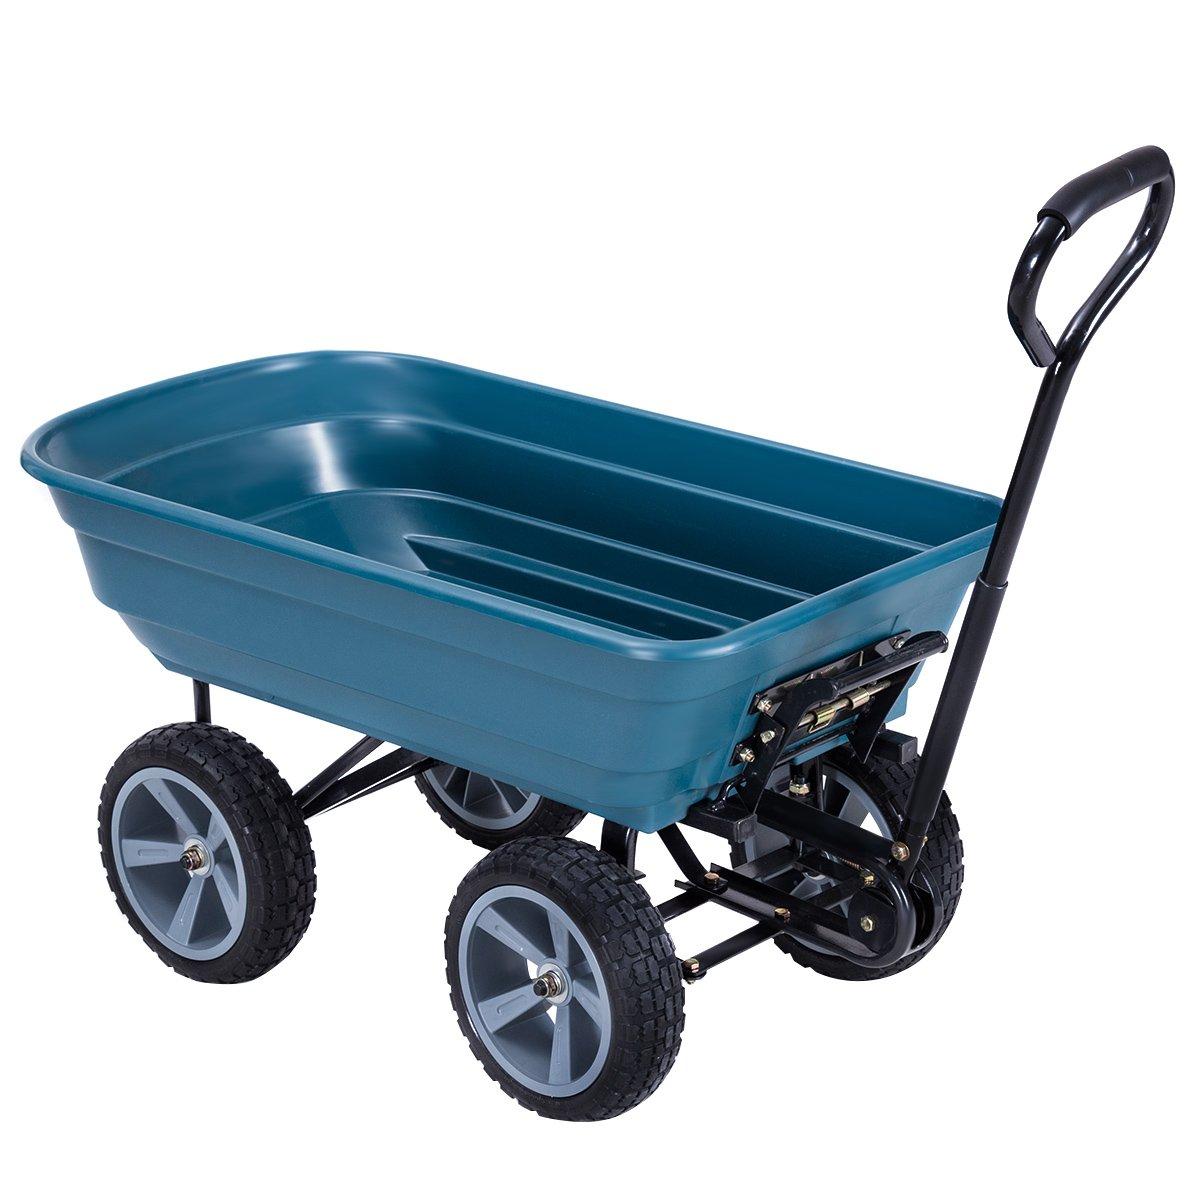 Giantex Heavy-Duty Garden Dump Cart Dumper Wagon Carrier Wheelbarrow Wagon Carrier Air Tires